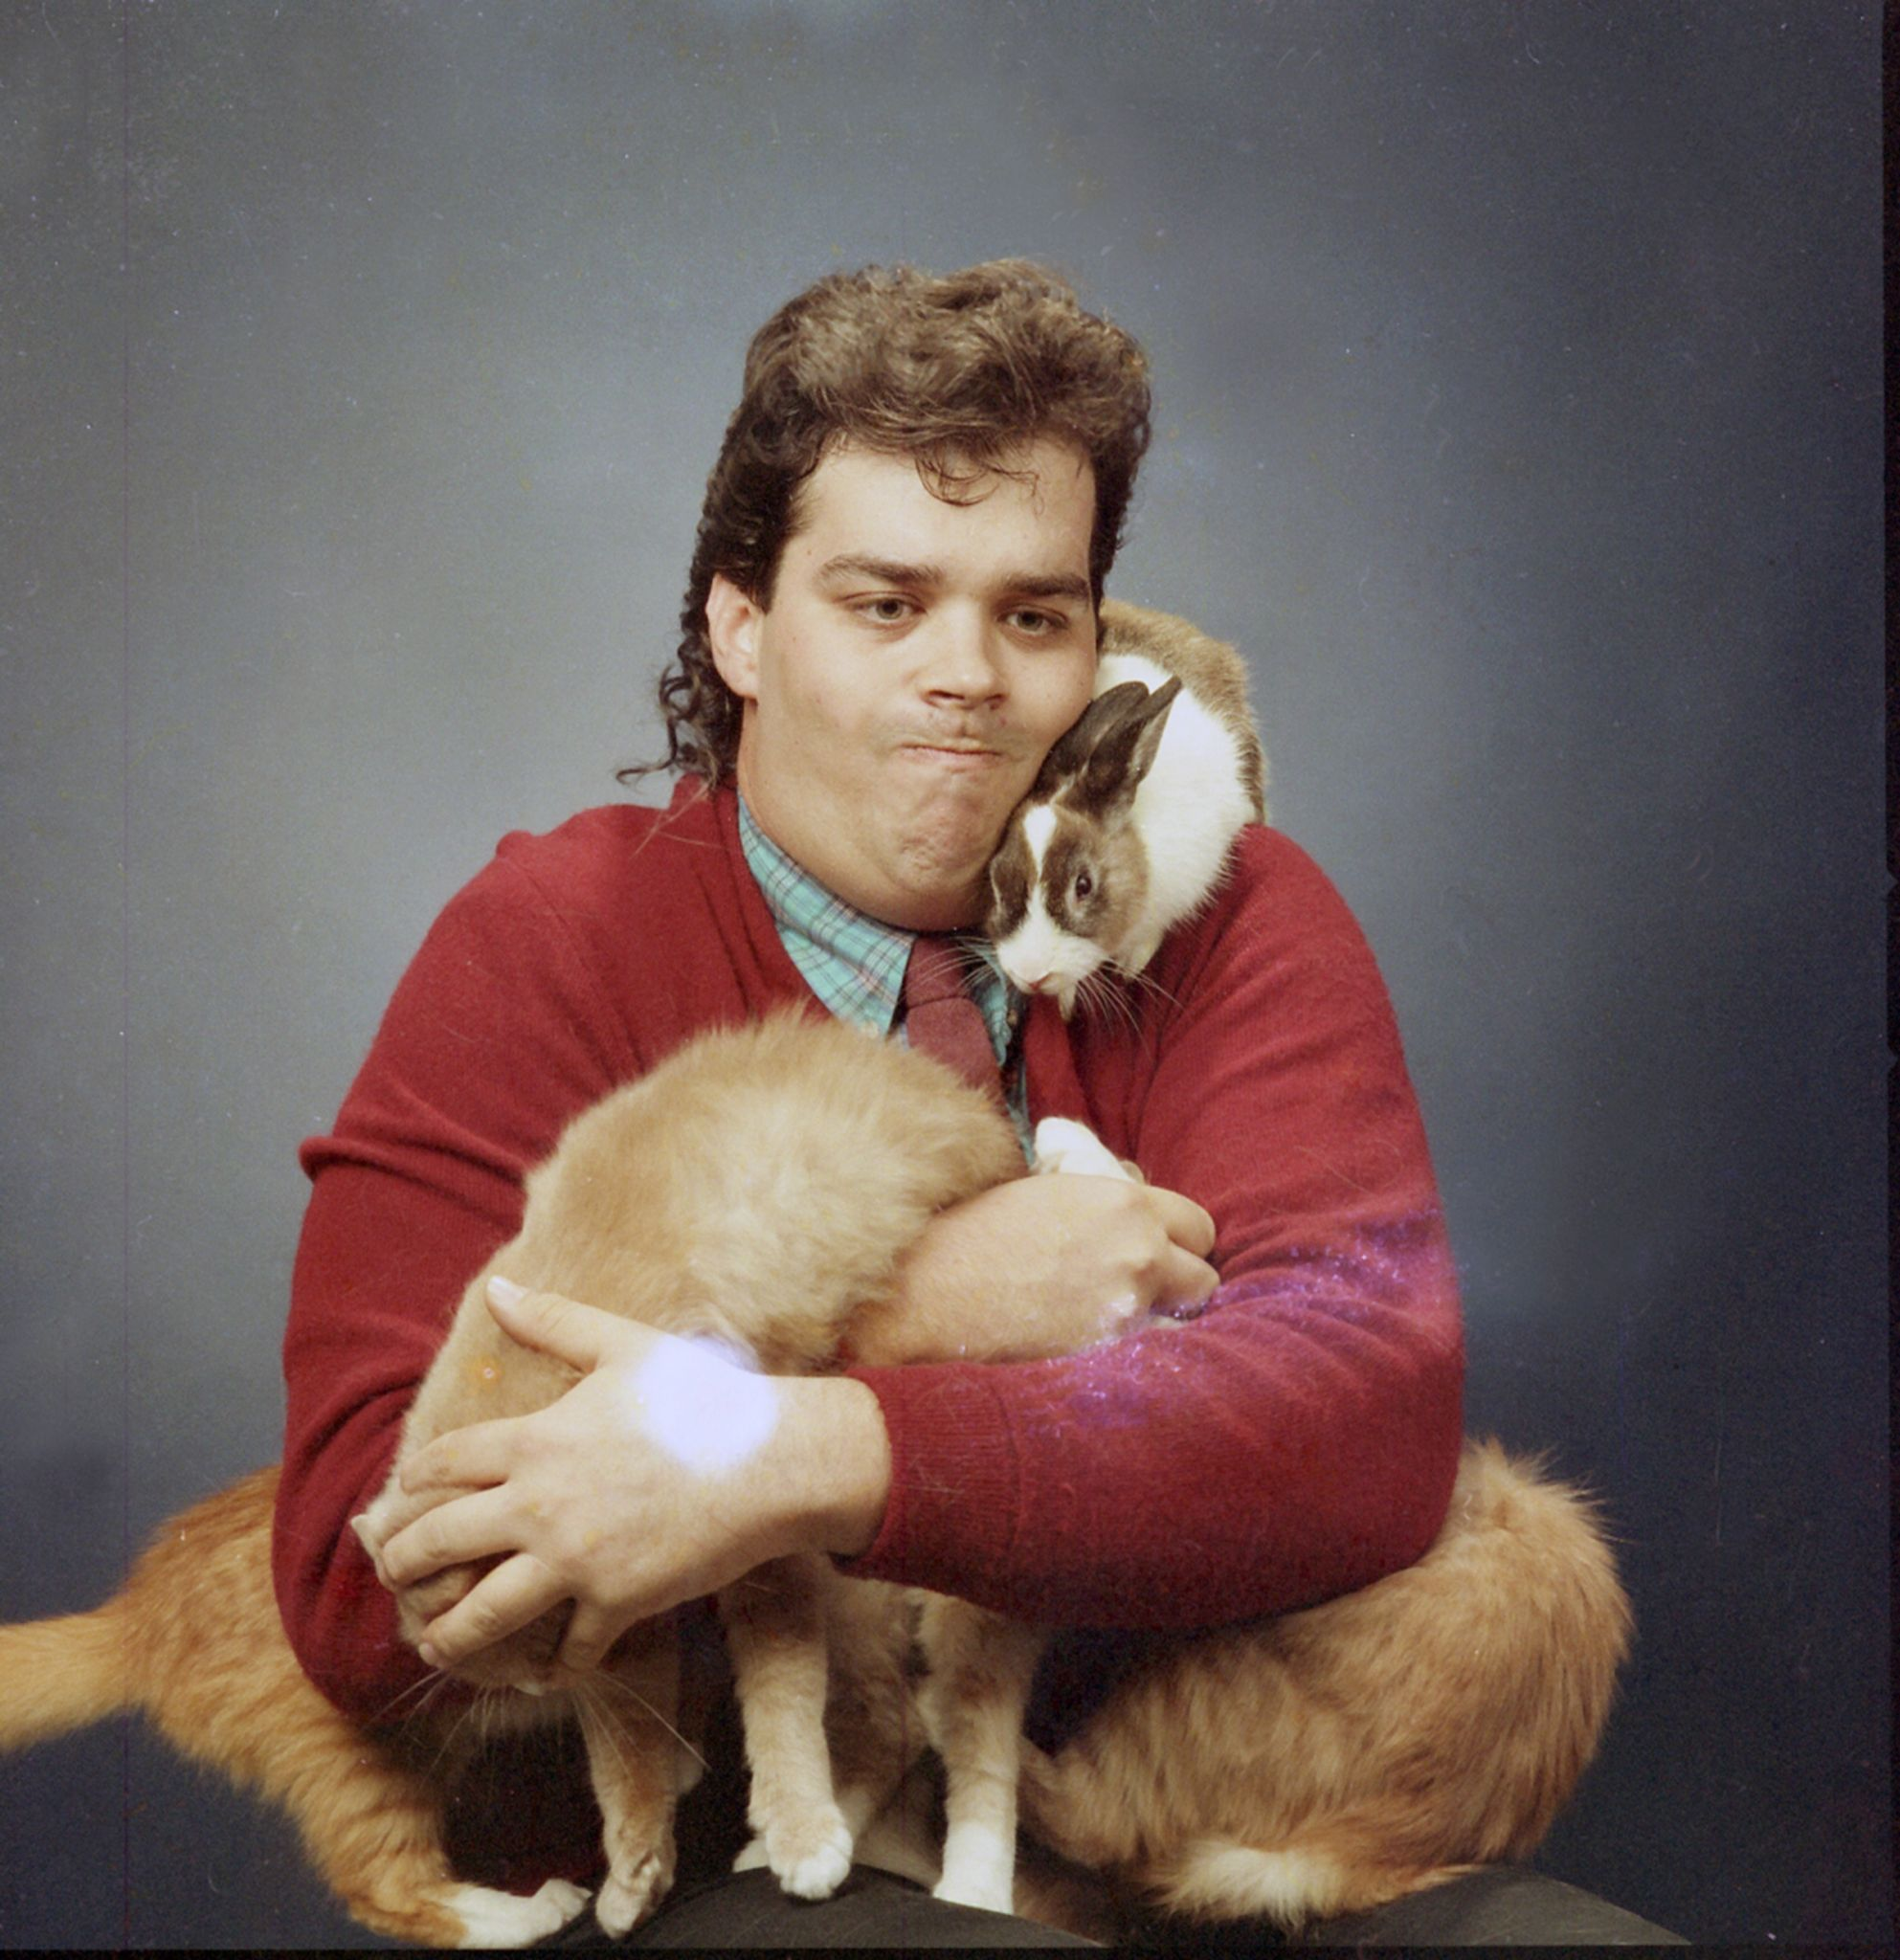 Pet Store Photoshoot